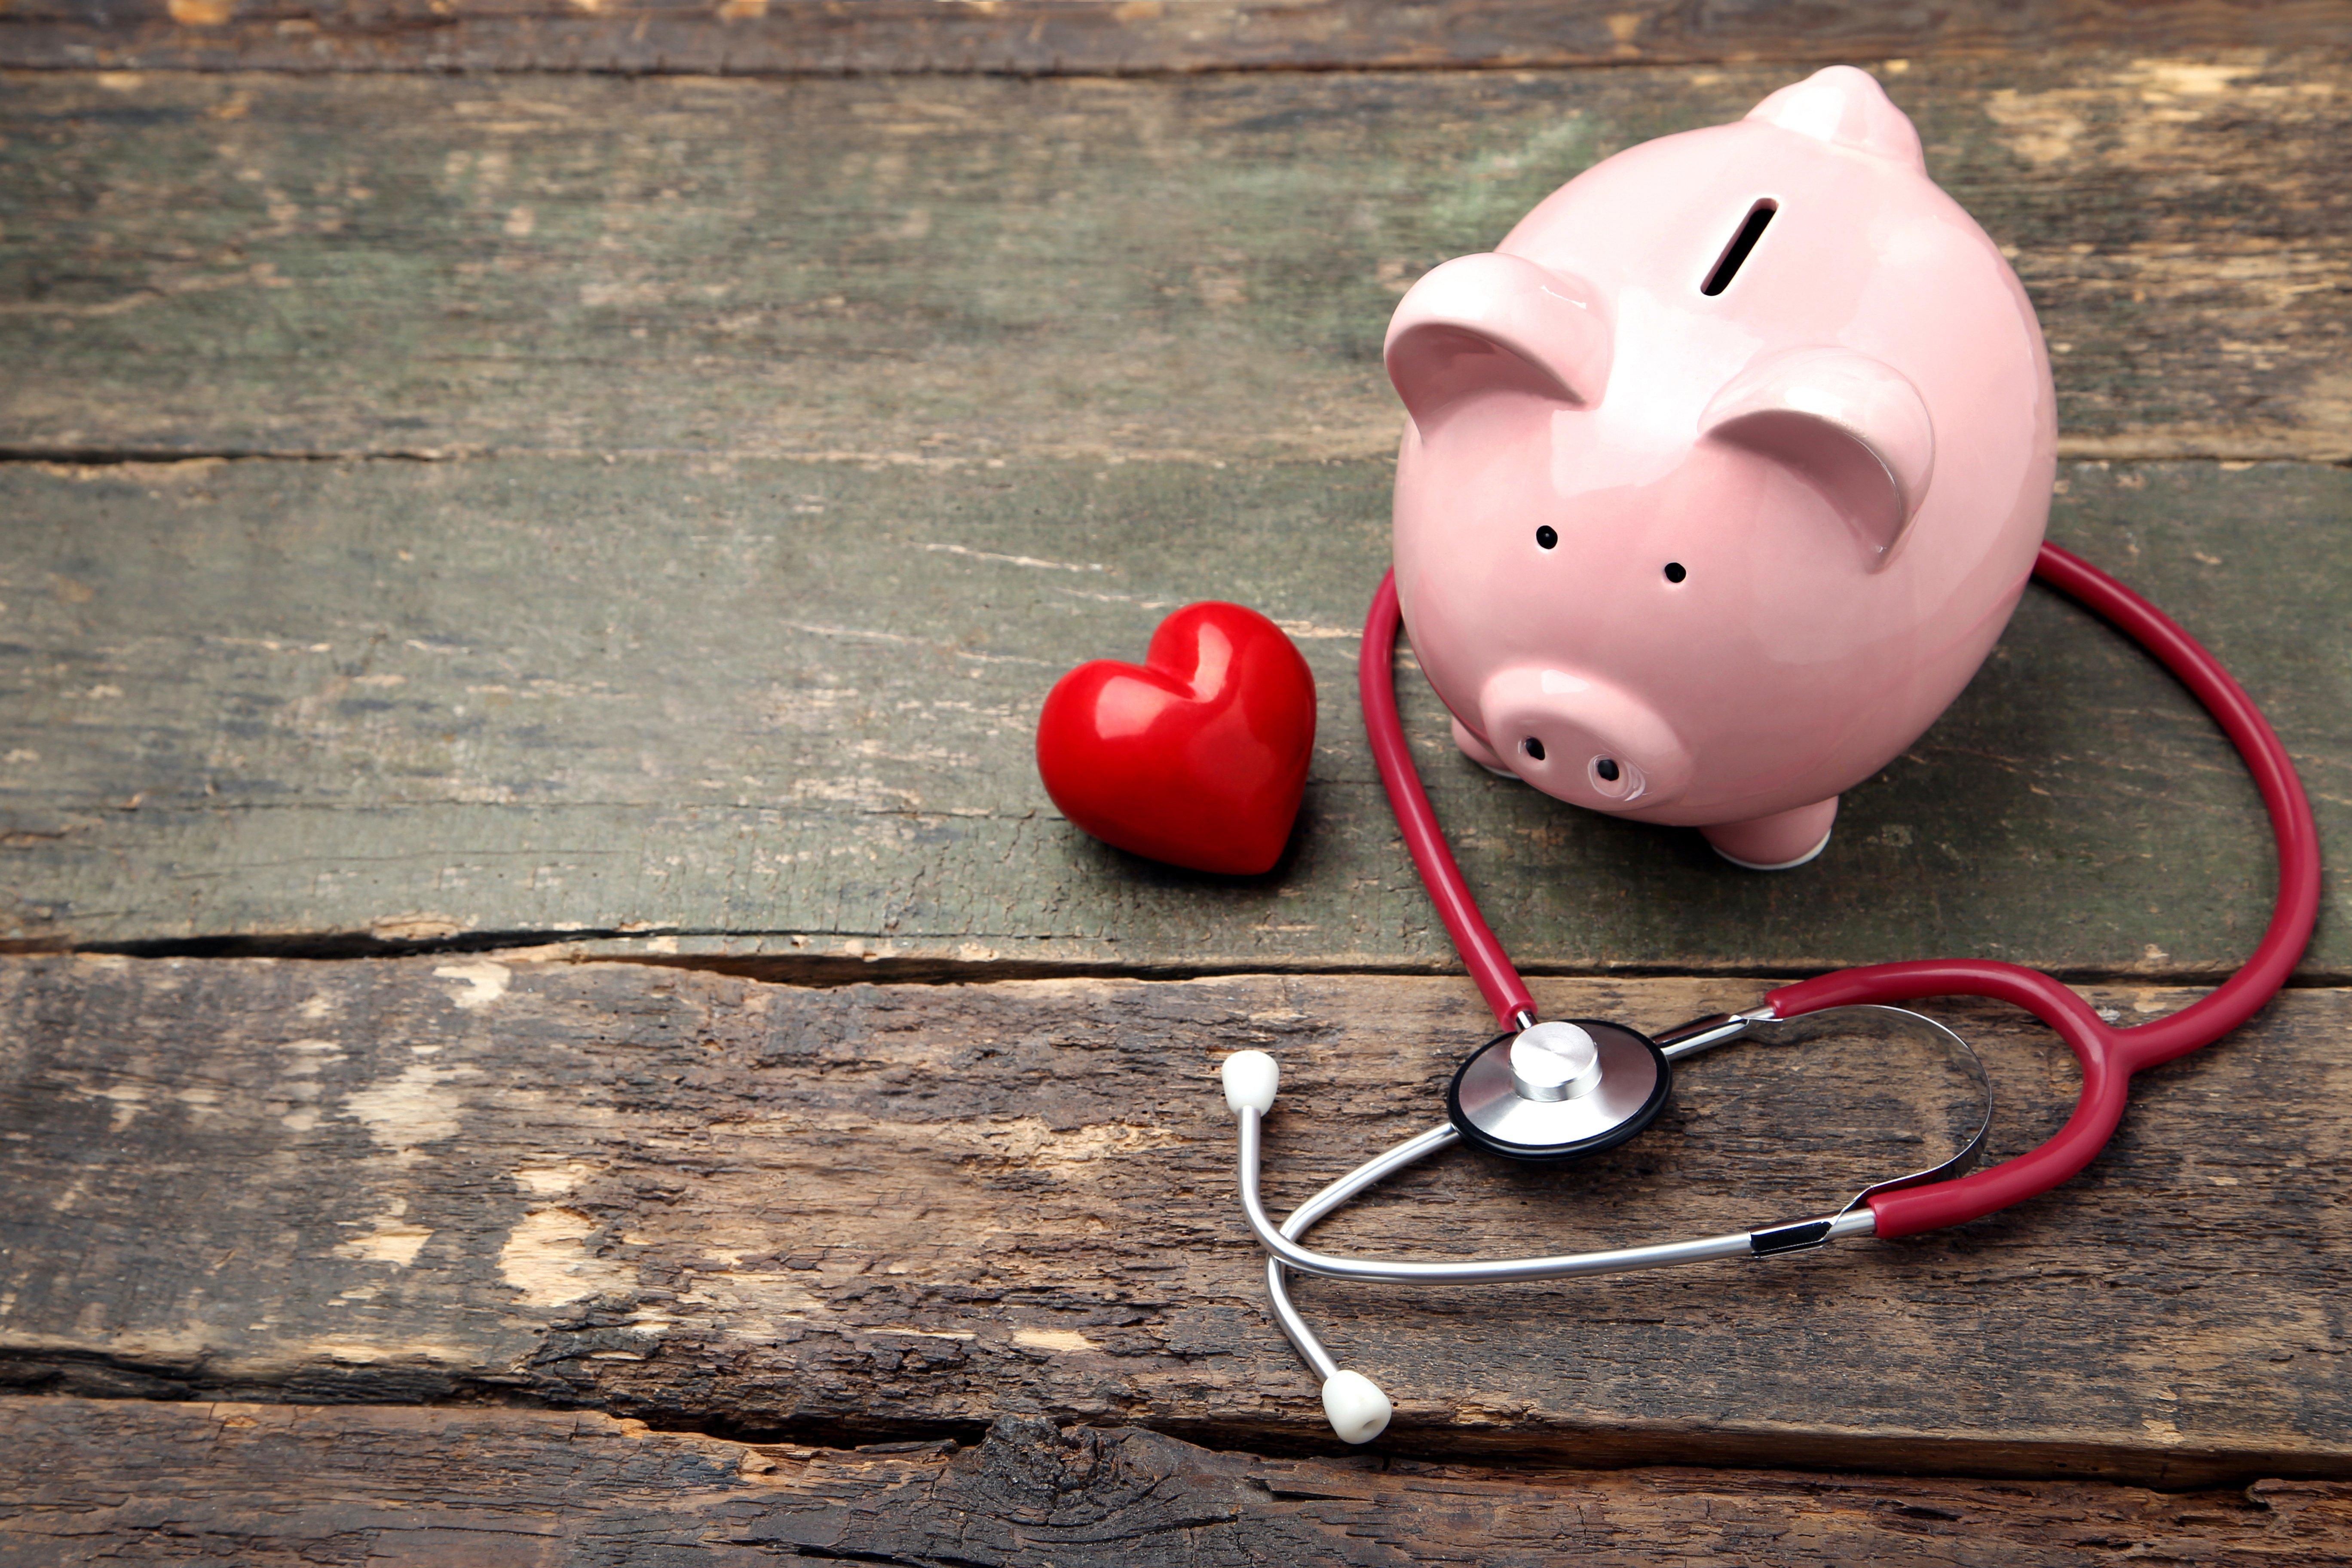 Healthcare Blue Book Savings | Healthcare Bluebook Review | What is Healthcare Bluebook?